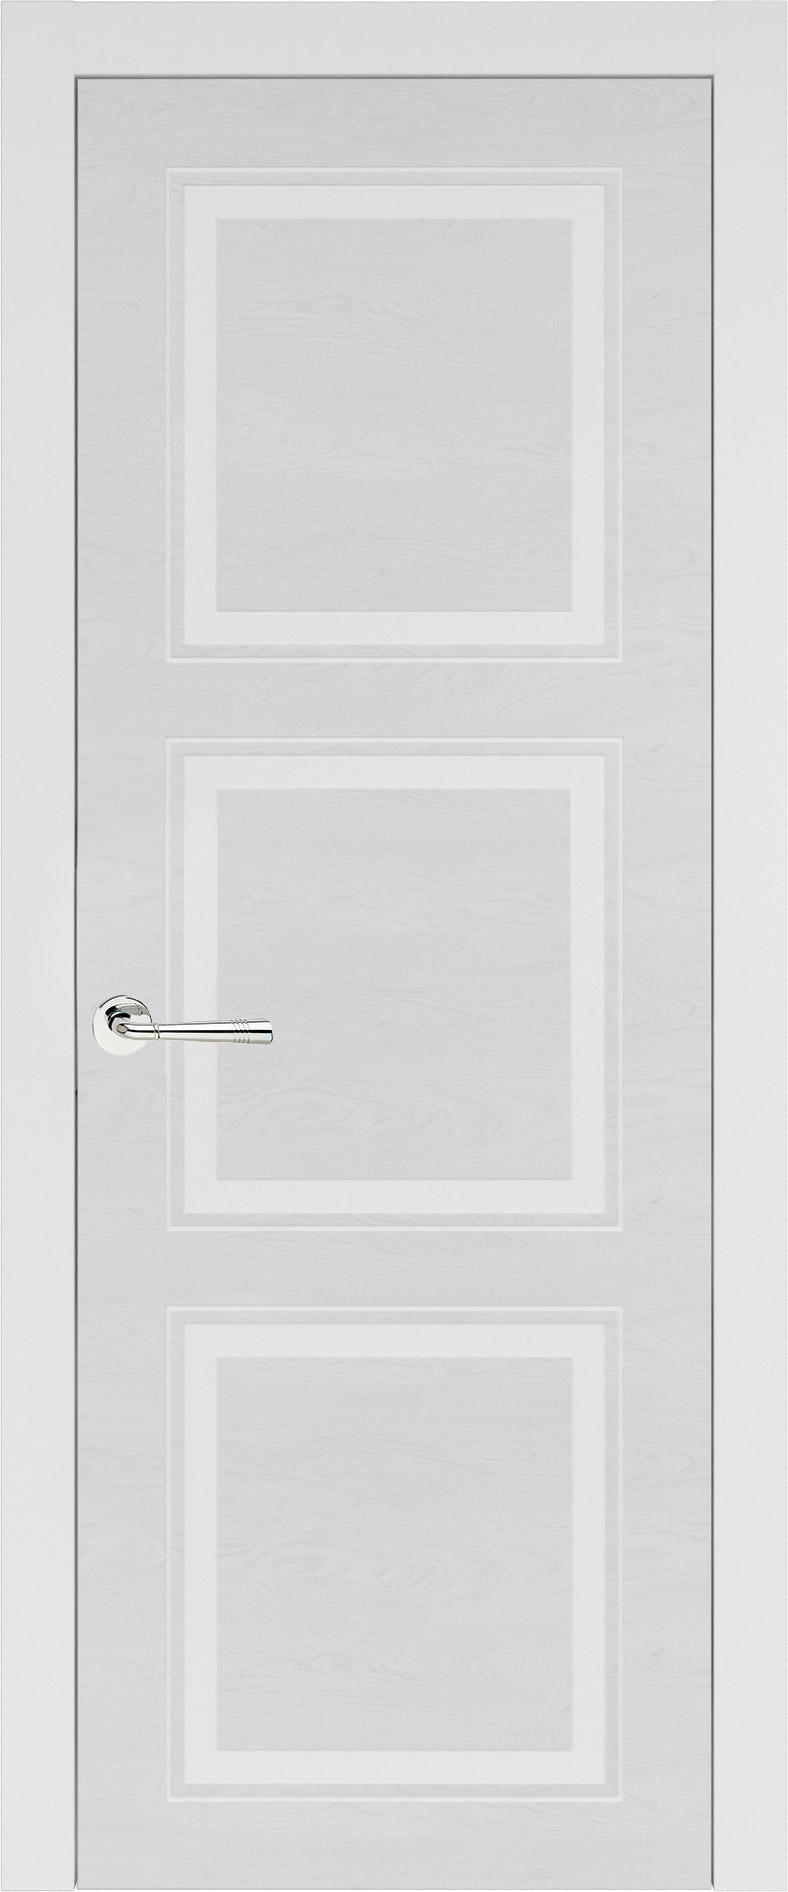 Milano Neo Classic цвет - Белая эмаль по шпону (RAL 9003) Без стекла (ДГ)